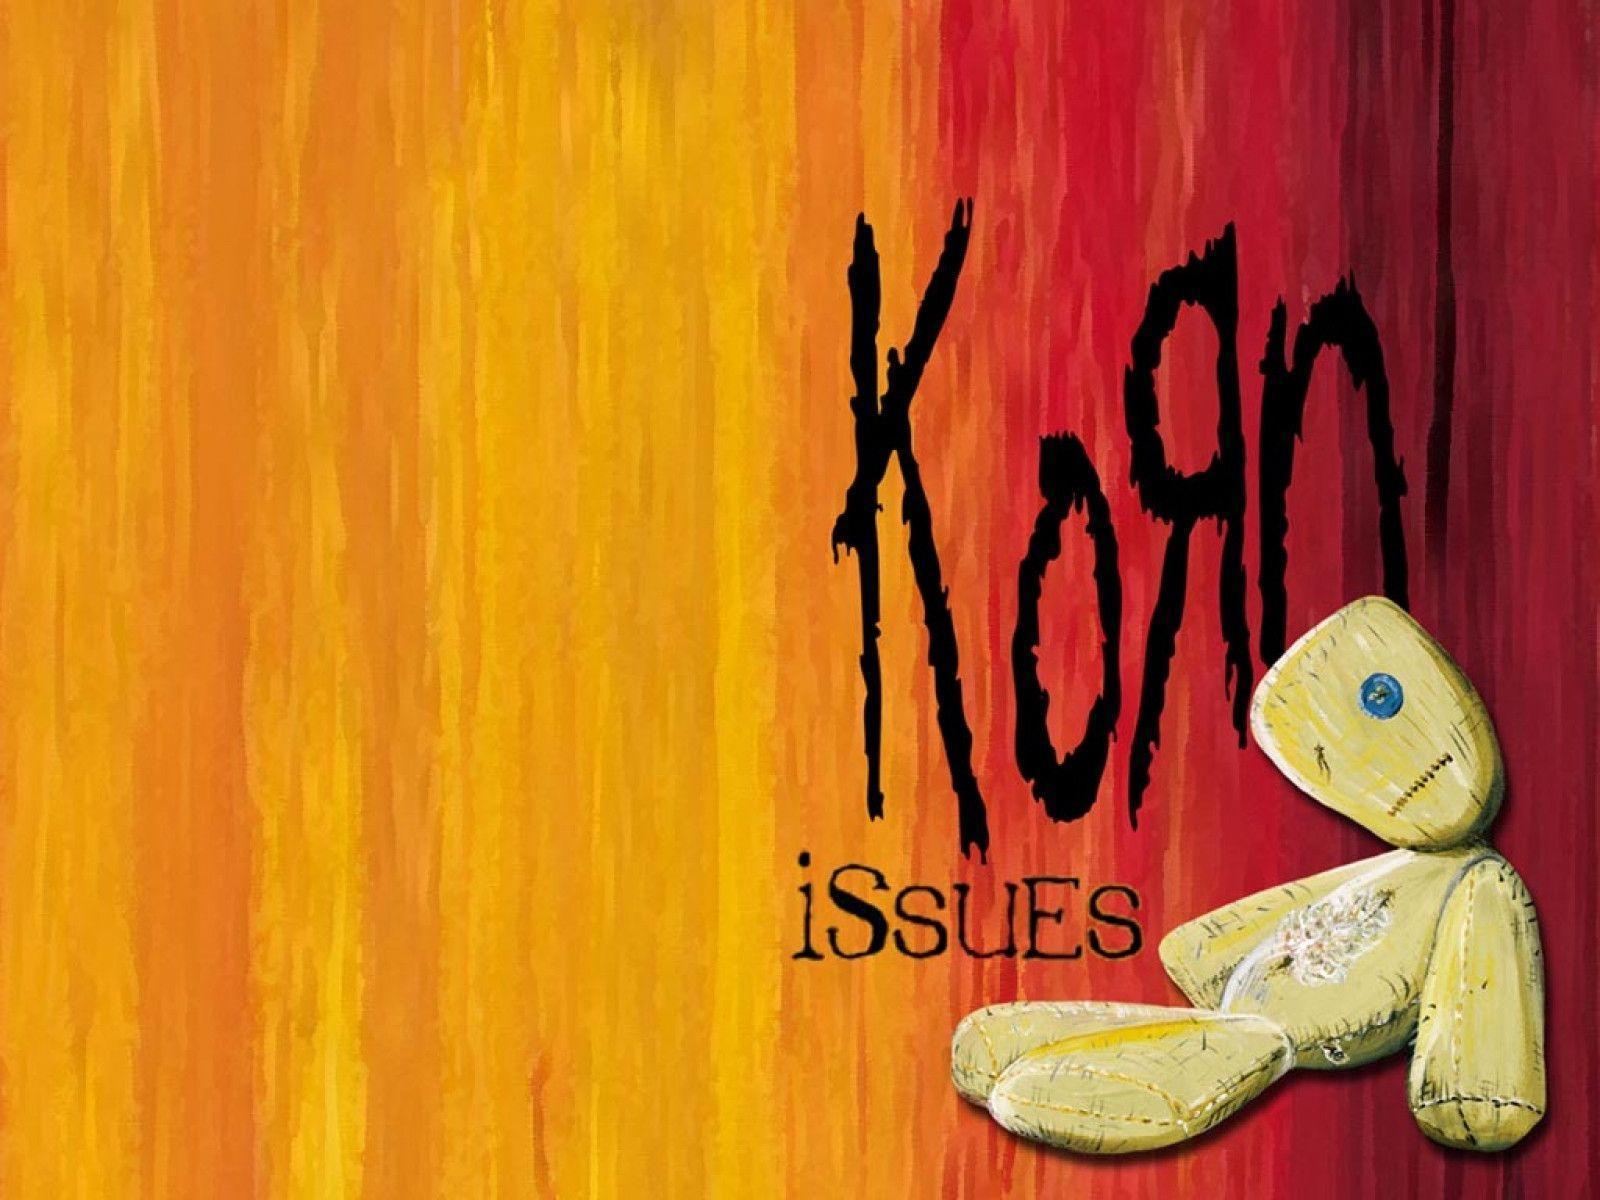 Wallpaper iphone korn - Korn Issues Wallpaper Images 12091 Wallpaper Wallpaper Screen